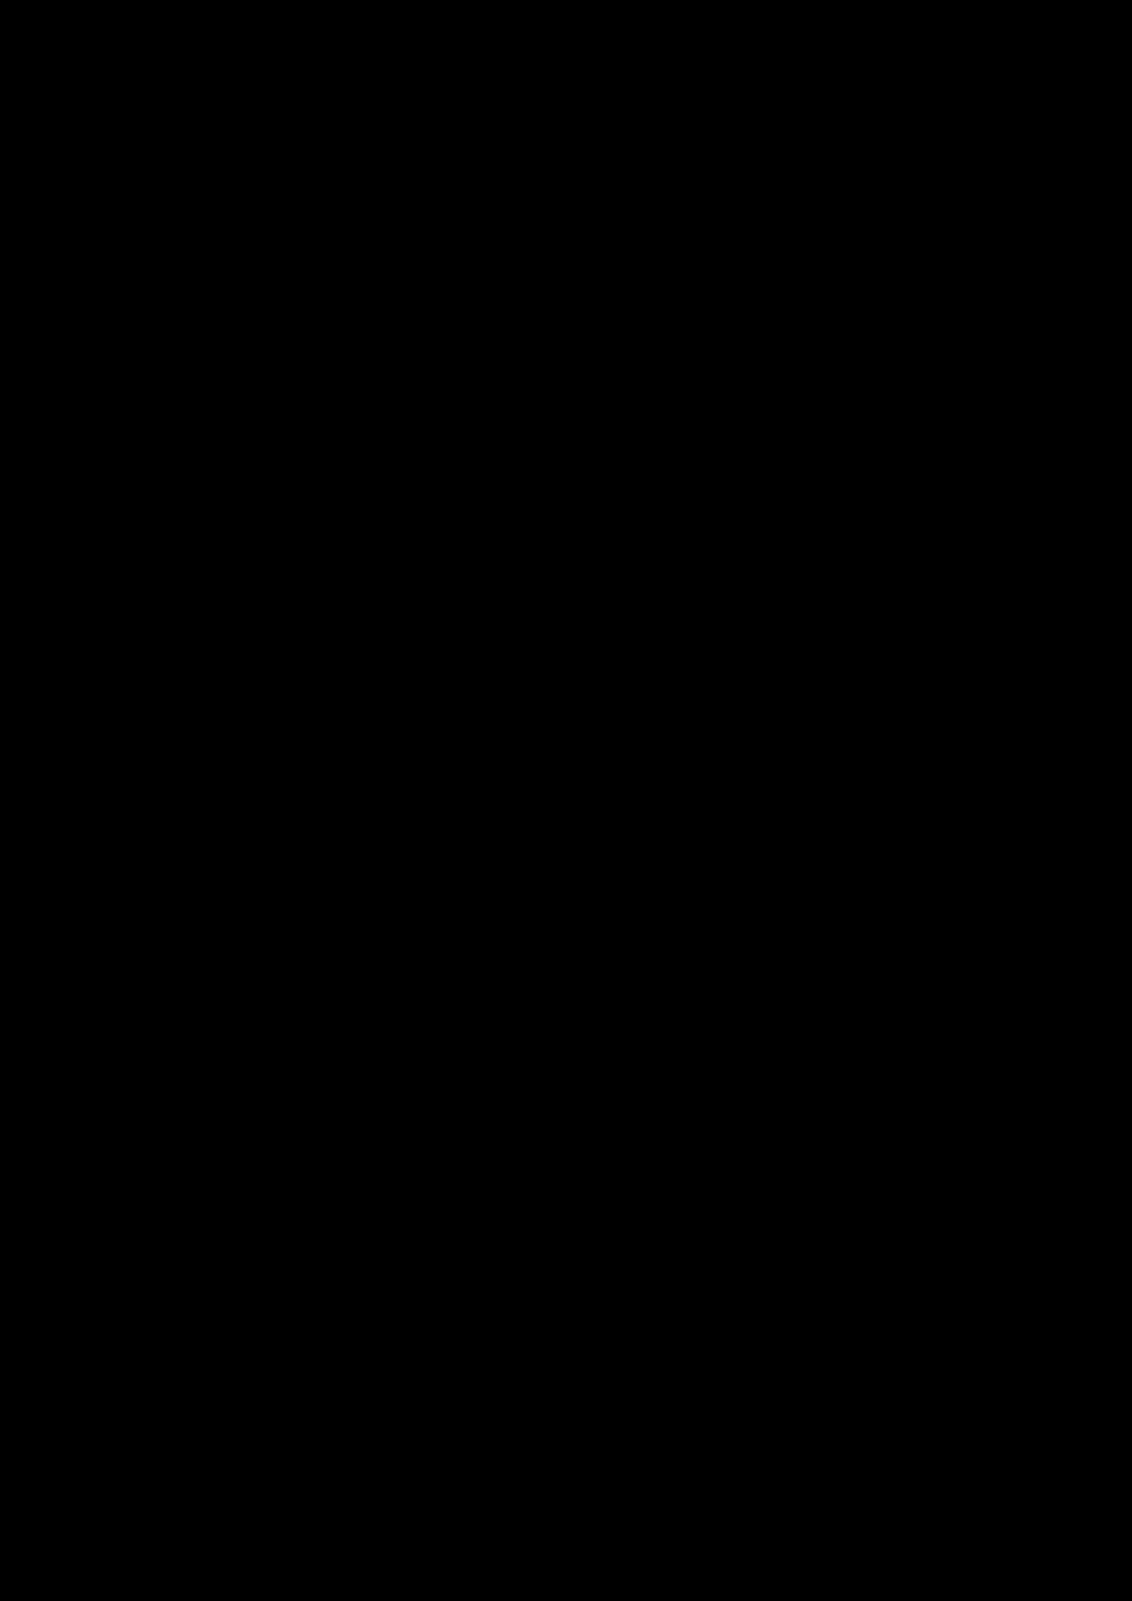 Ten lyubvi slide, Image 41